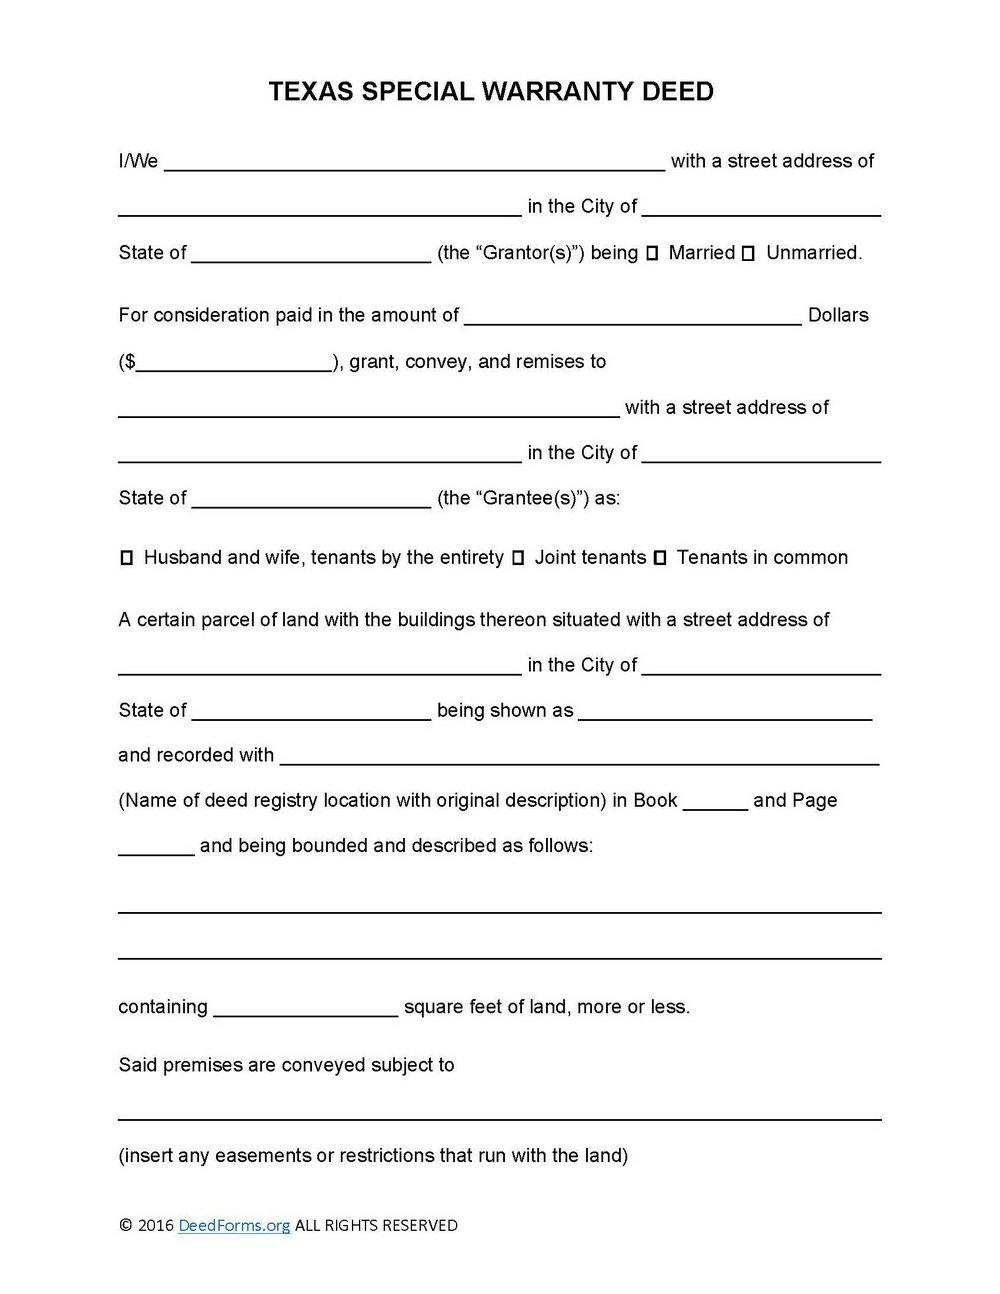 Free Texas Warranty Deed Form Download